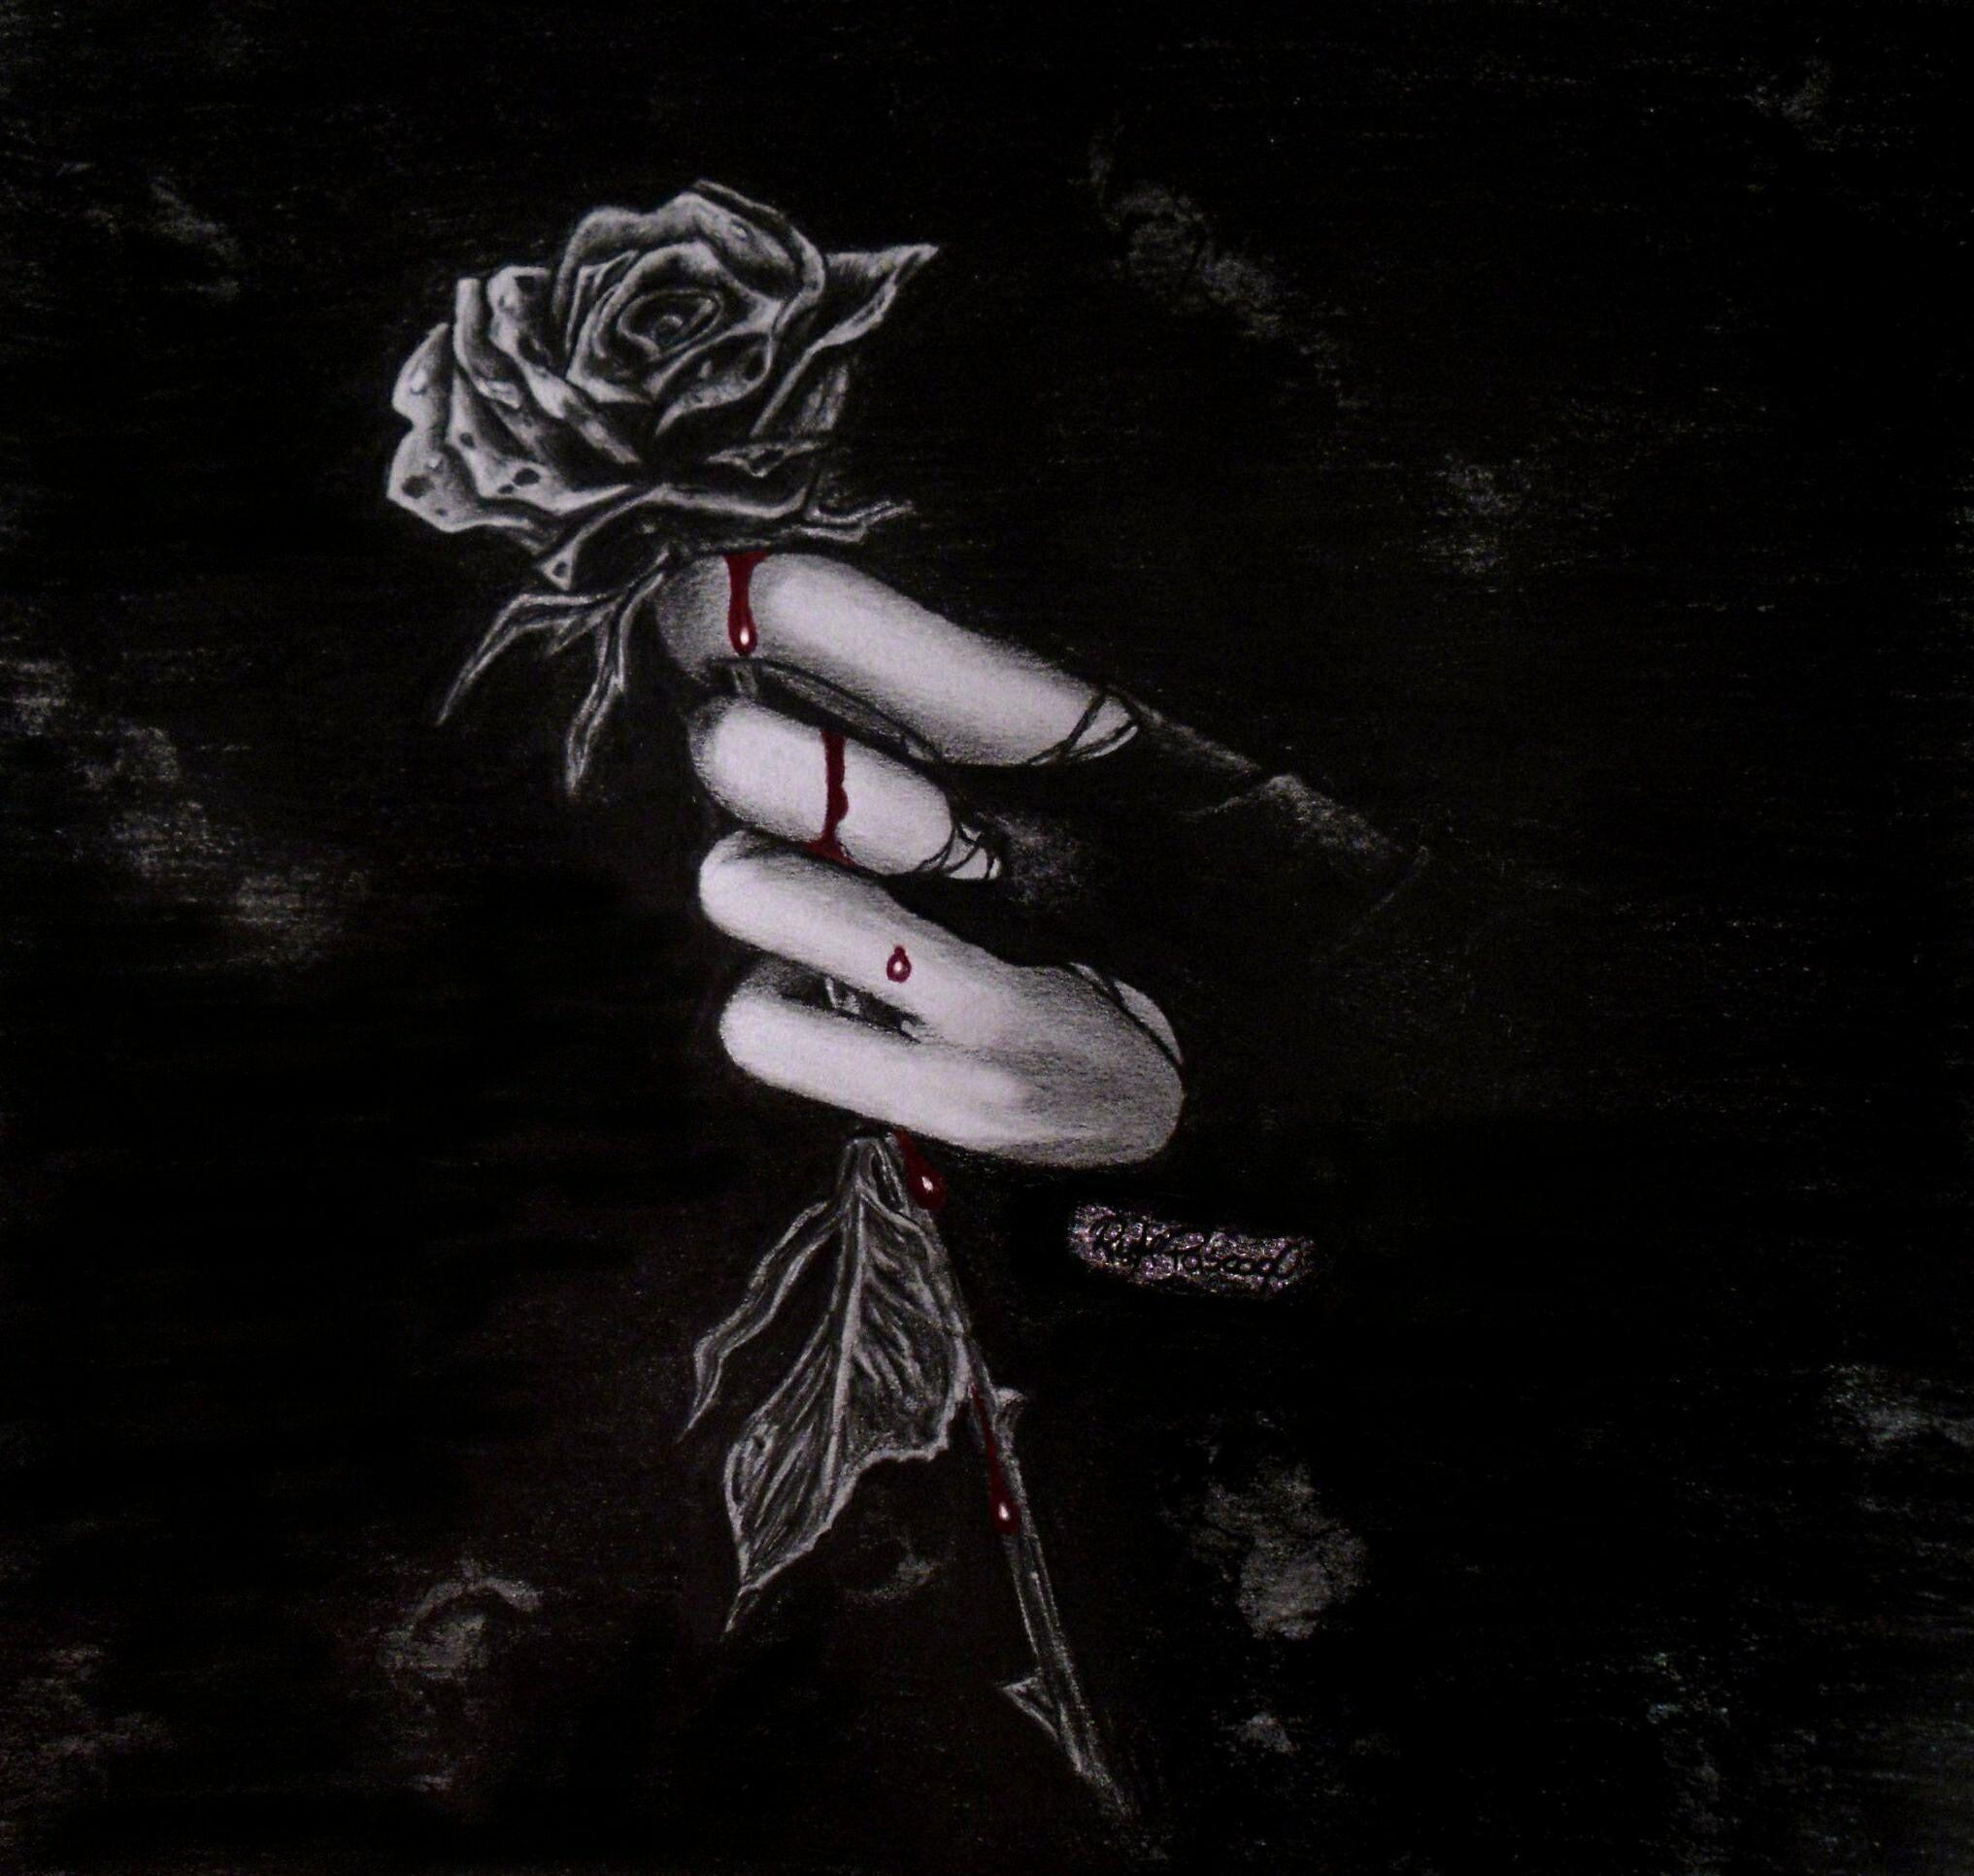 Blood Drop Black Rose Gothicmedievil Pinterest Black